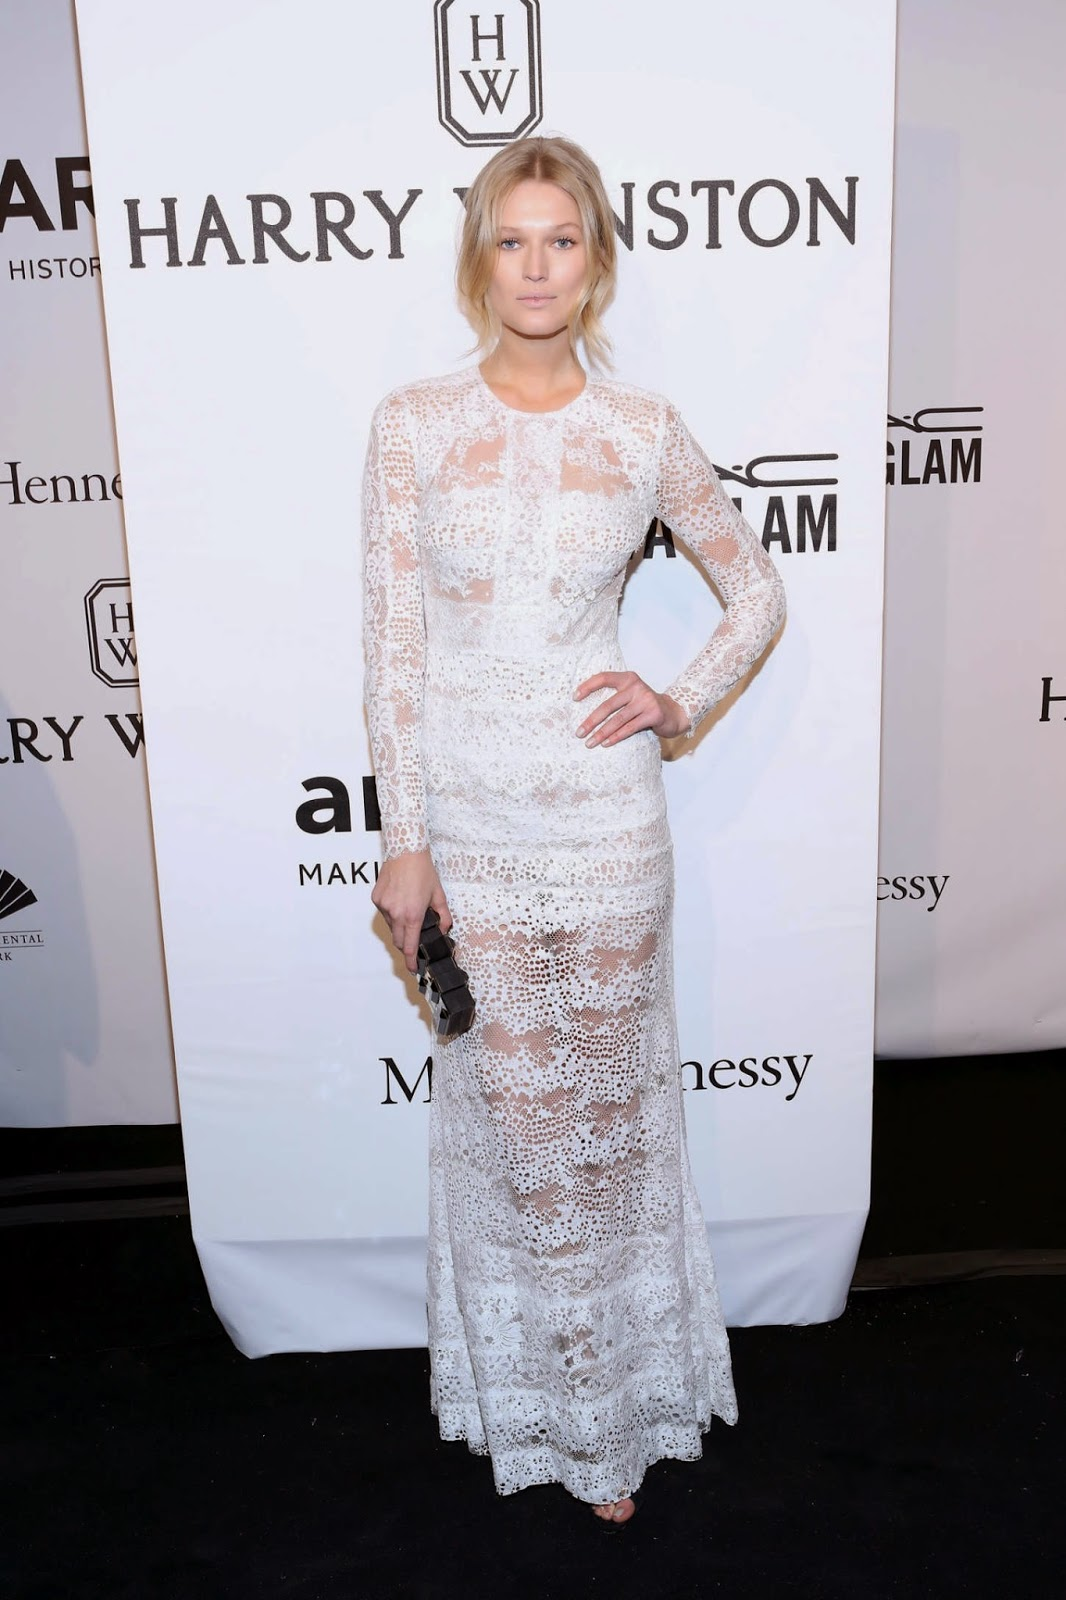 Celebrity Fashion at the 2015 amfAR Gala in New York City